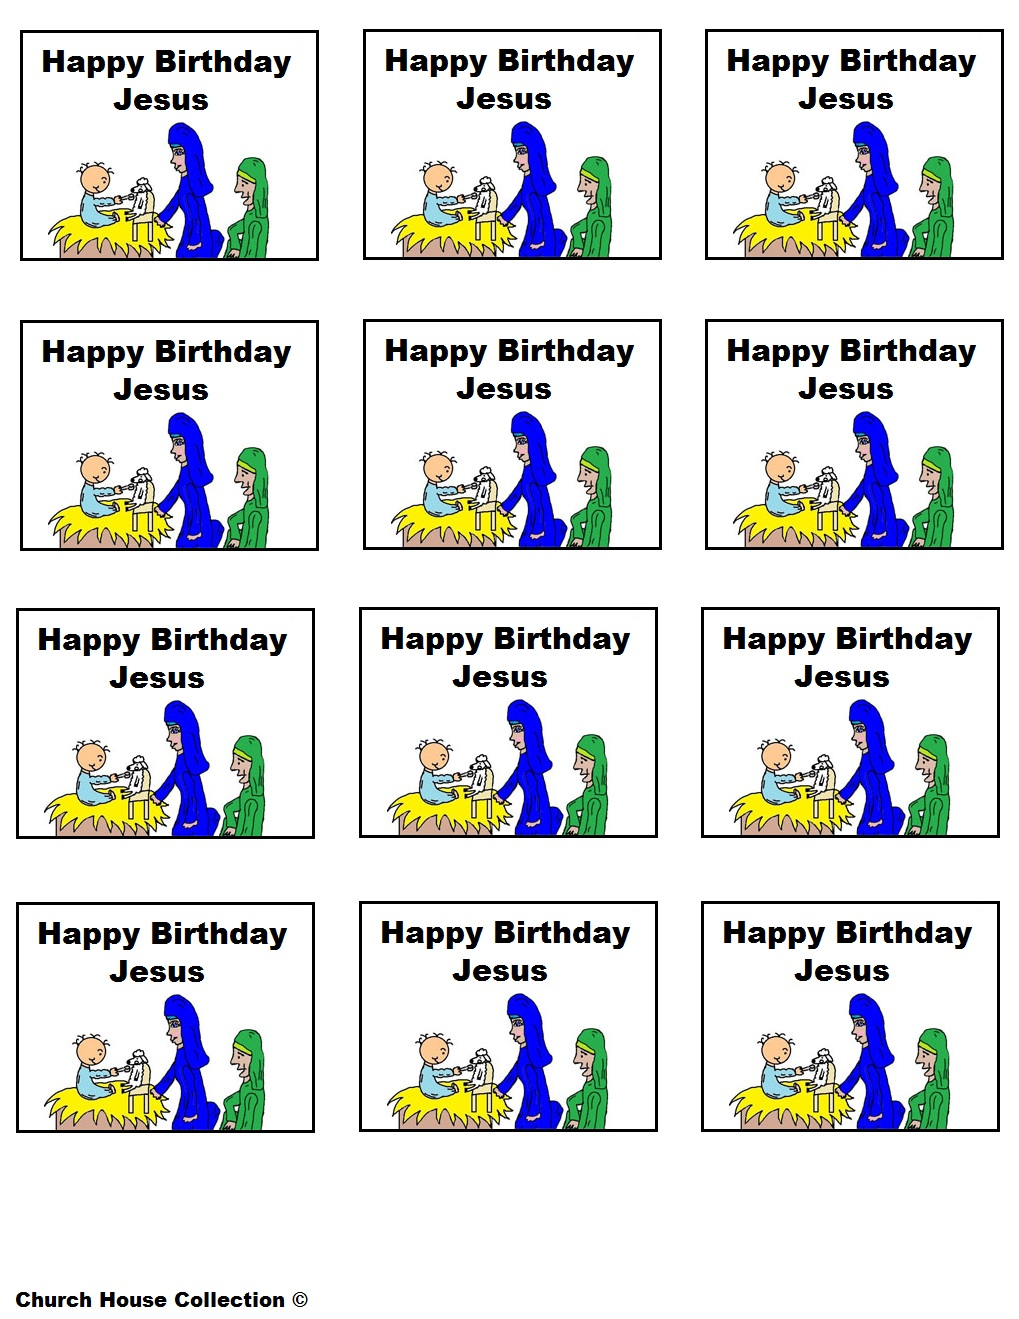 Happy Birthday Jesus Sunday School Lesson – Happy Birthday Word Template